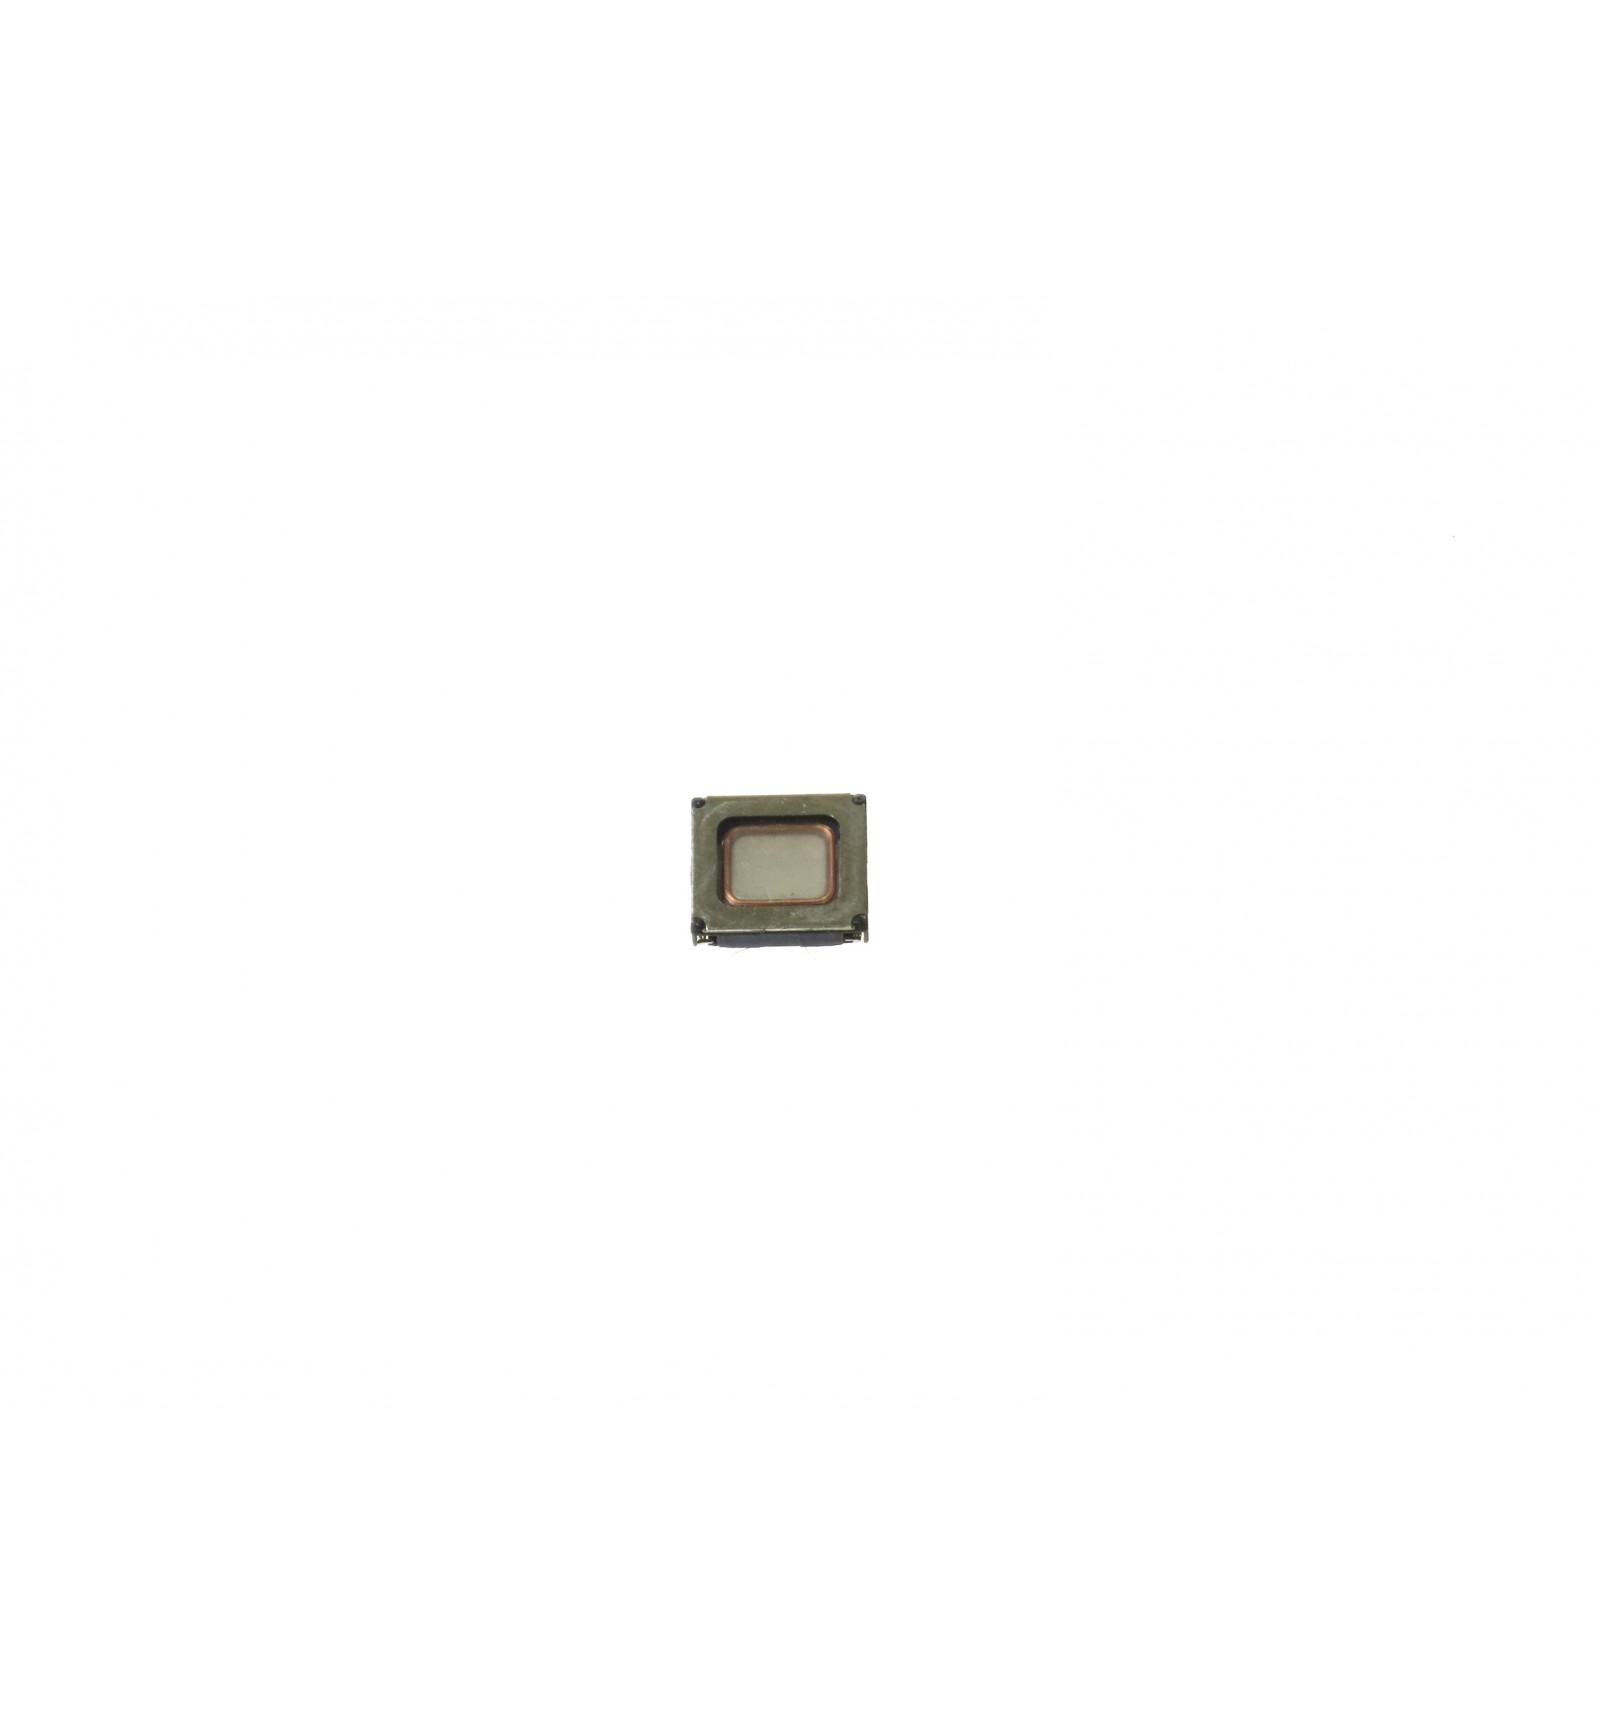 Sluch U00e1tko N U00e1hrada For Huawei P8 Lite  Ale